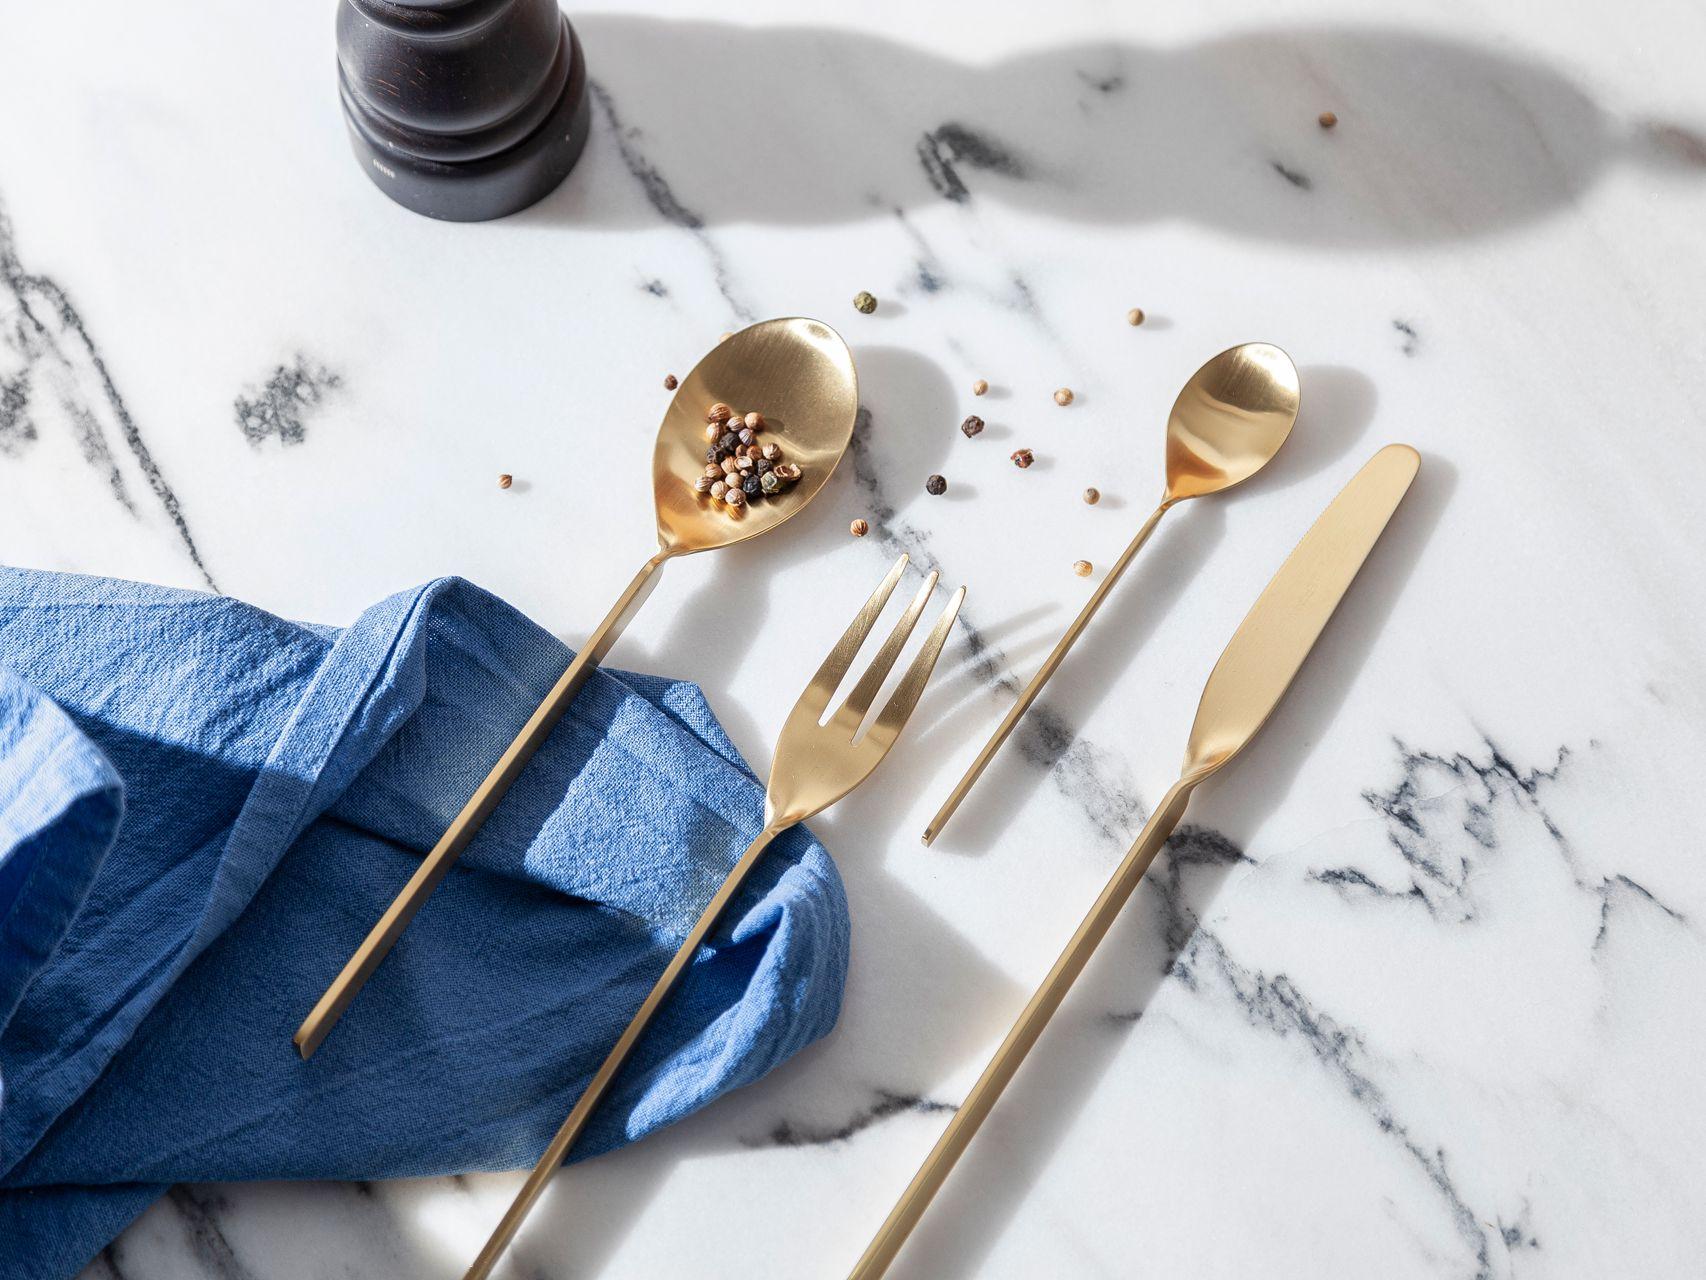 Malmo Cutlery